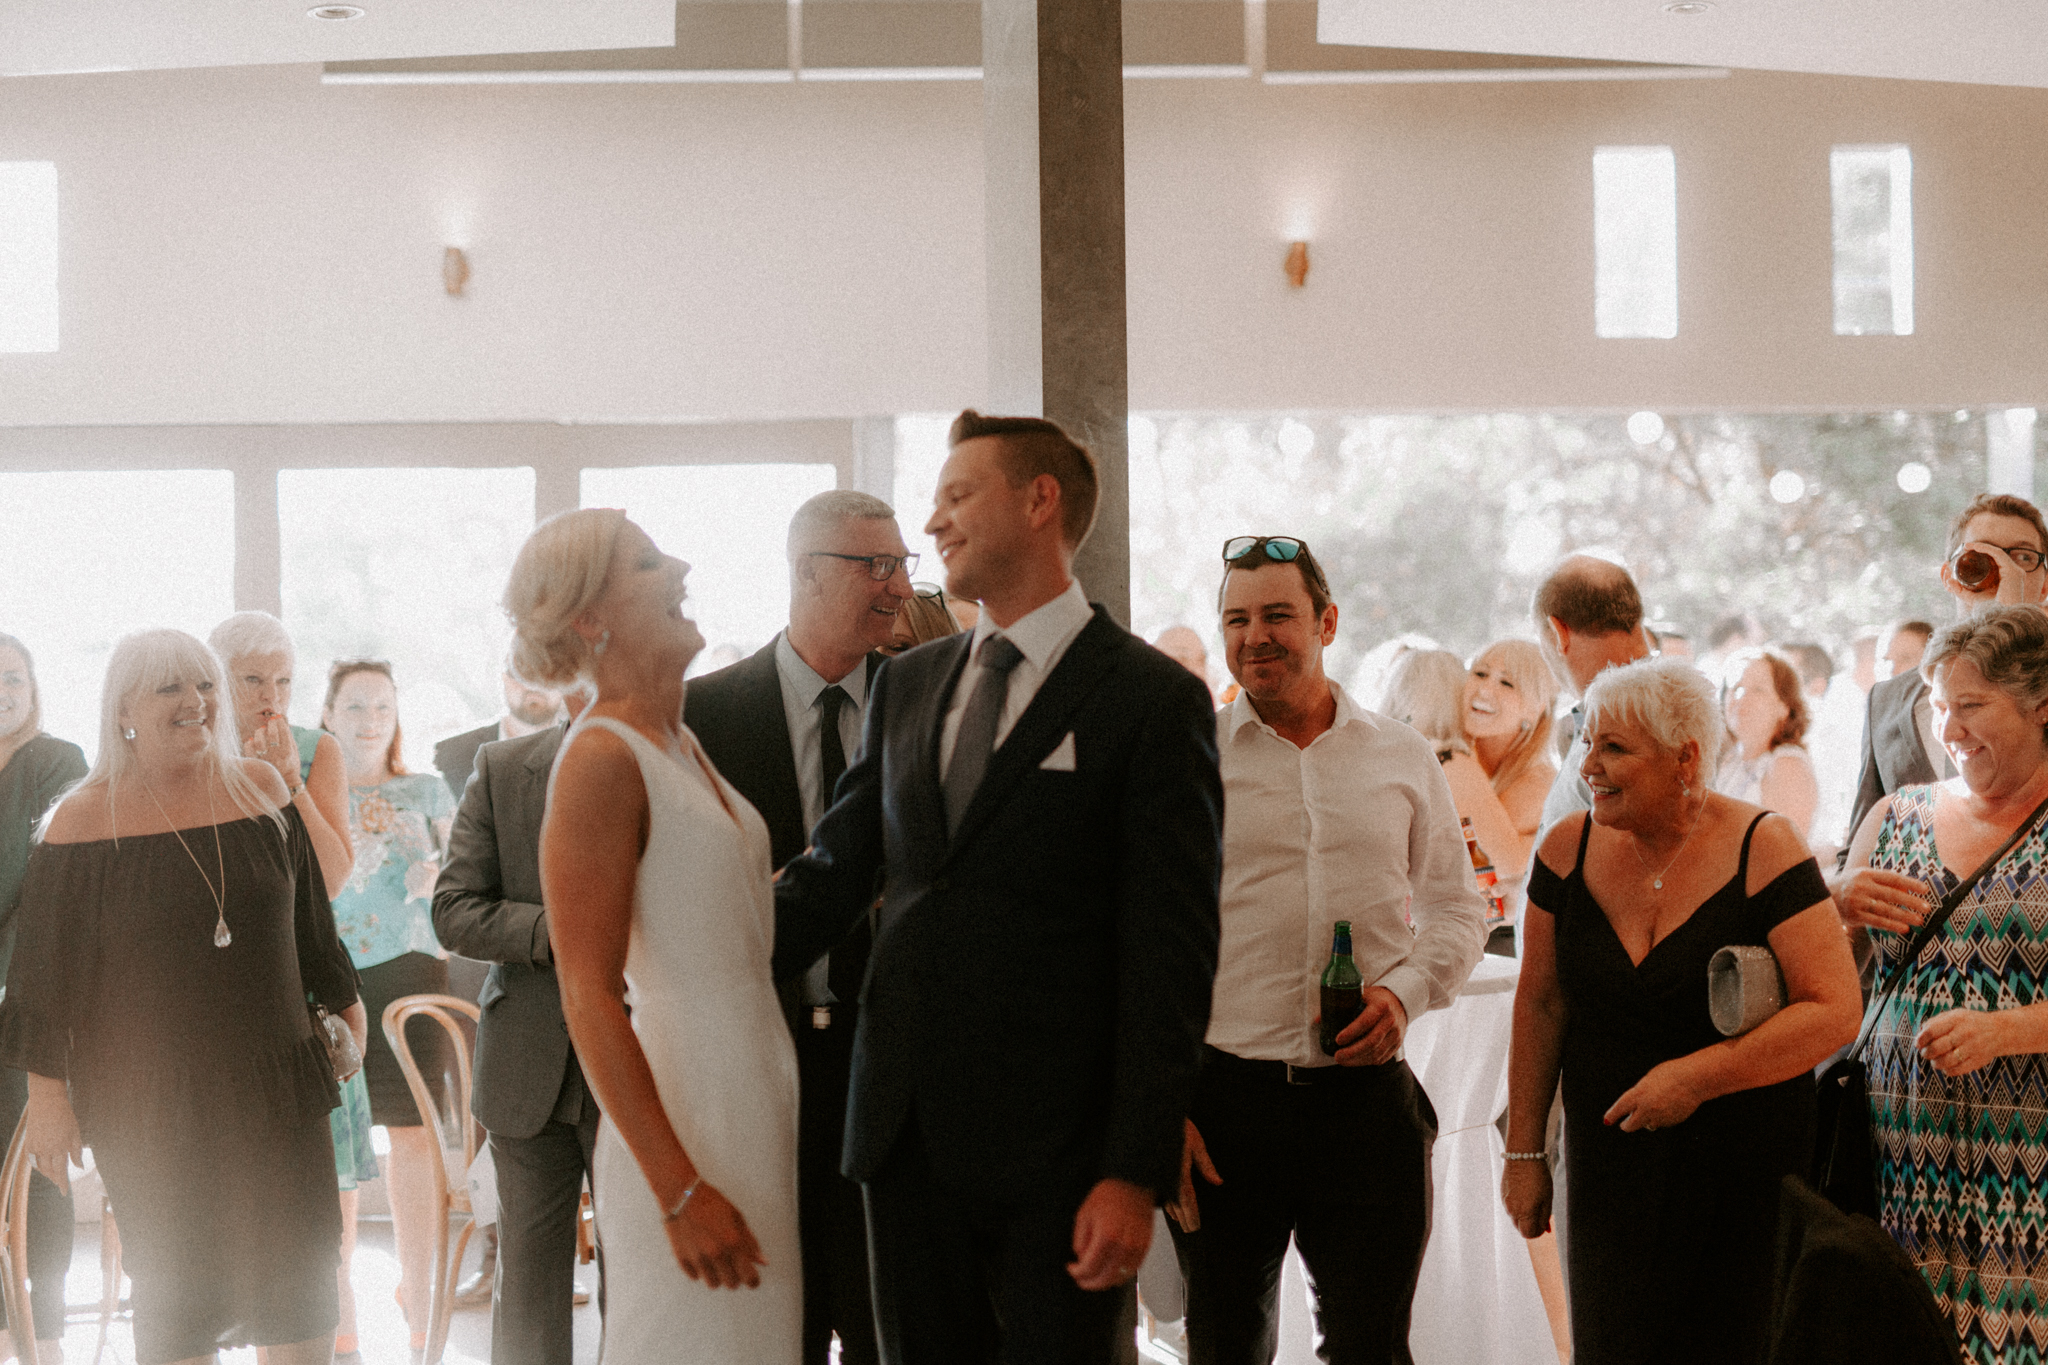 St-Kilda-Garden-Wedding-Emotions-and-Math-Photograph-185.jpg